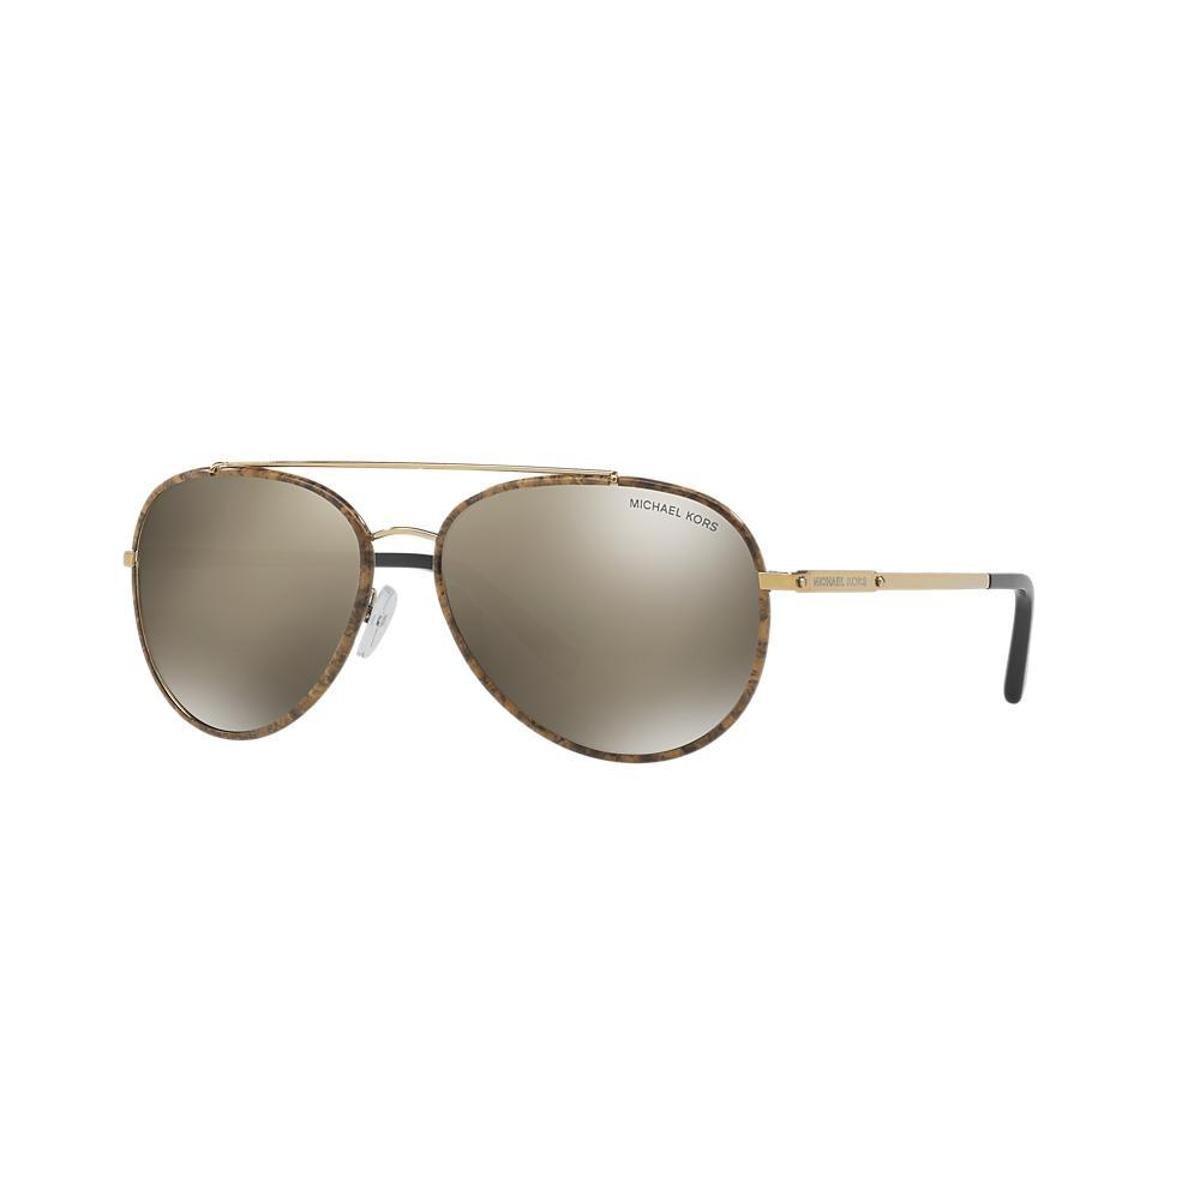 914ed3a10a475 Óculos de Sol Michael Kors Piloto MK1019 Ida Feminino - Compre Agora ...